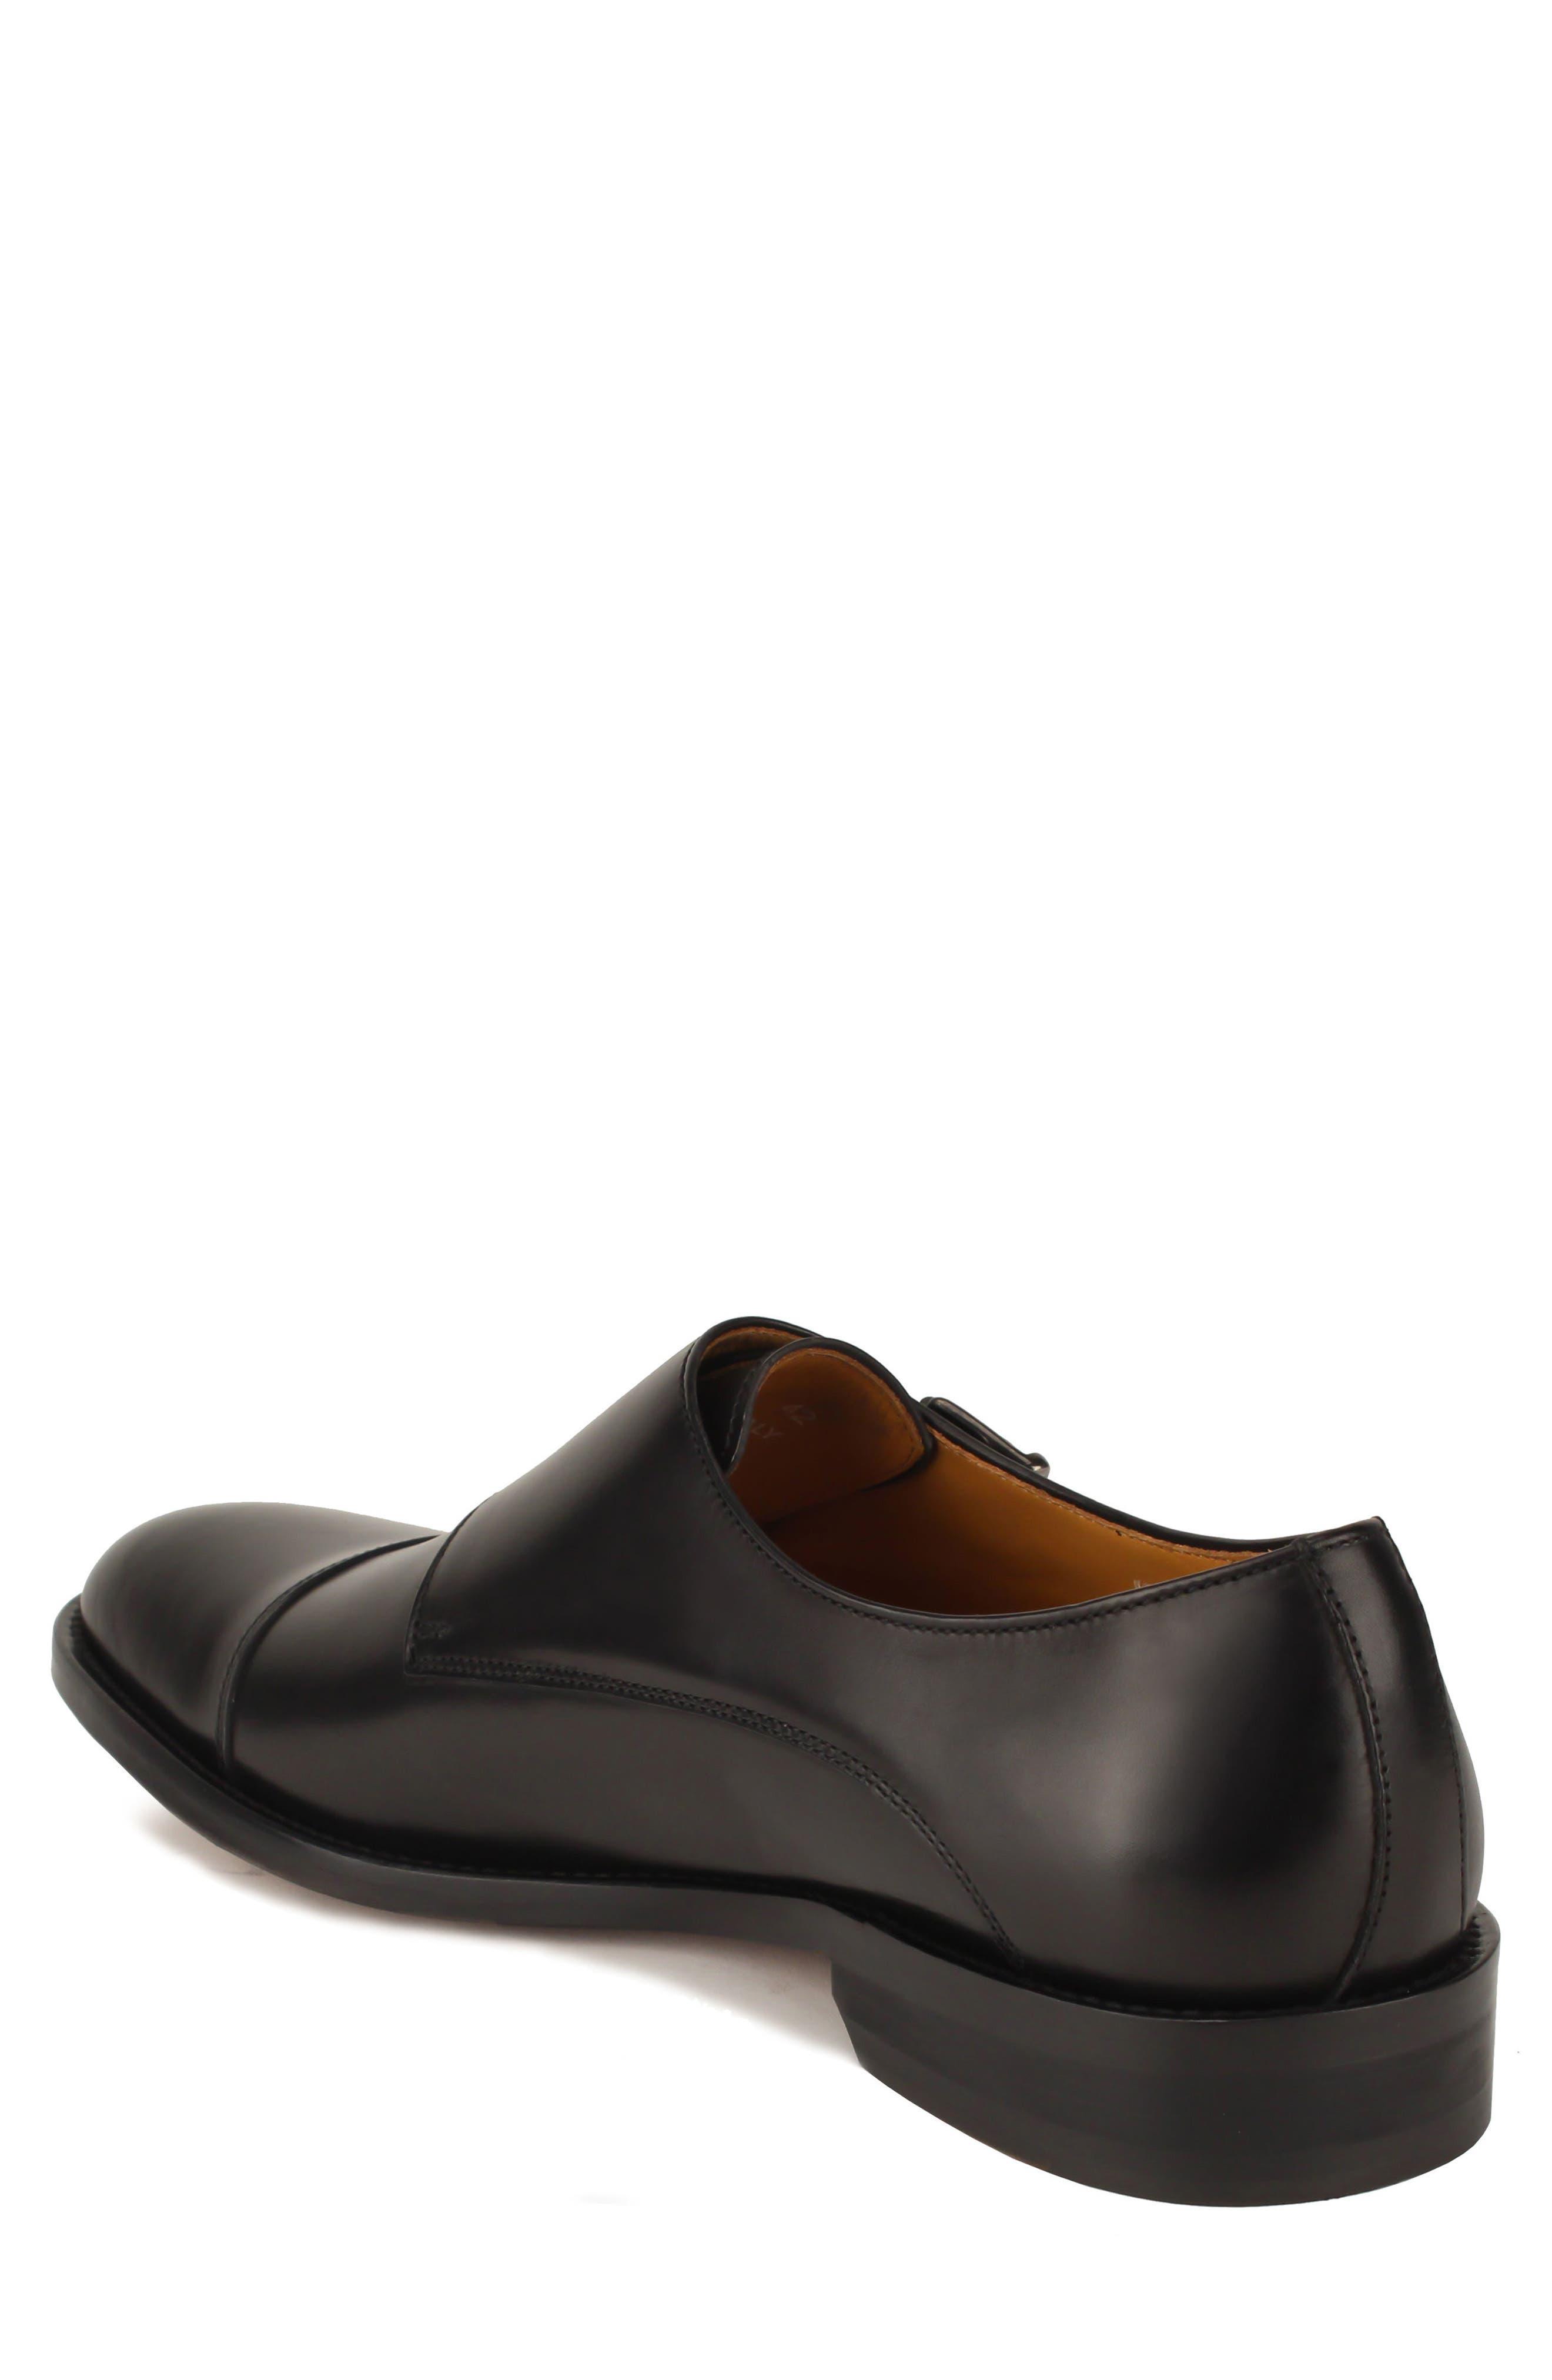 Jay Double Monk Strap Shoe,                             Alternate thumbnail 2, color,                             BLACK LEATHER